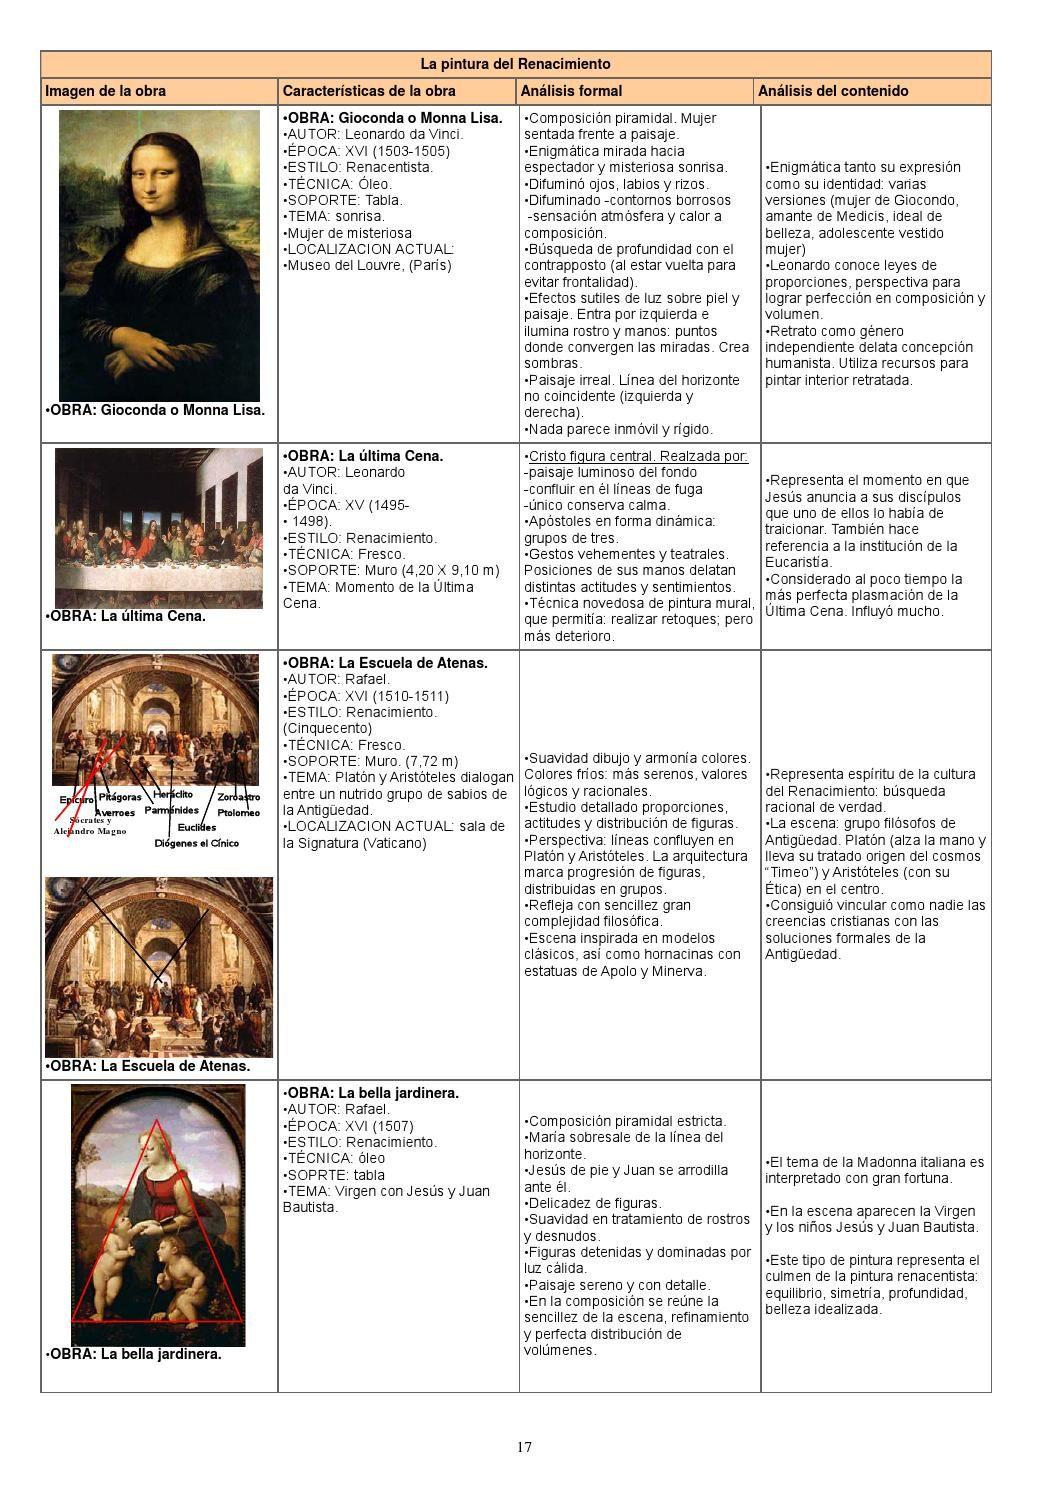 Resumen De Historia Del Arte Completo Make It Simple Digital Publishing Historia